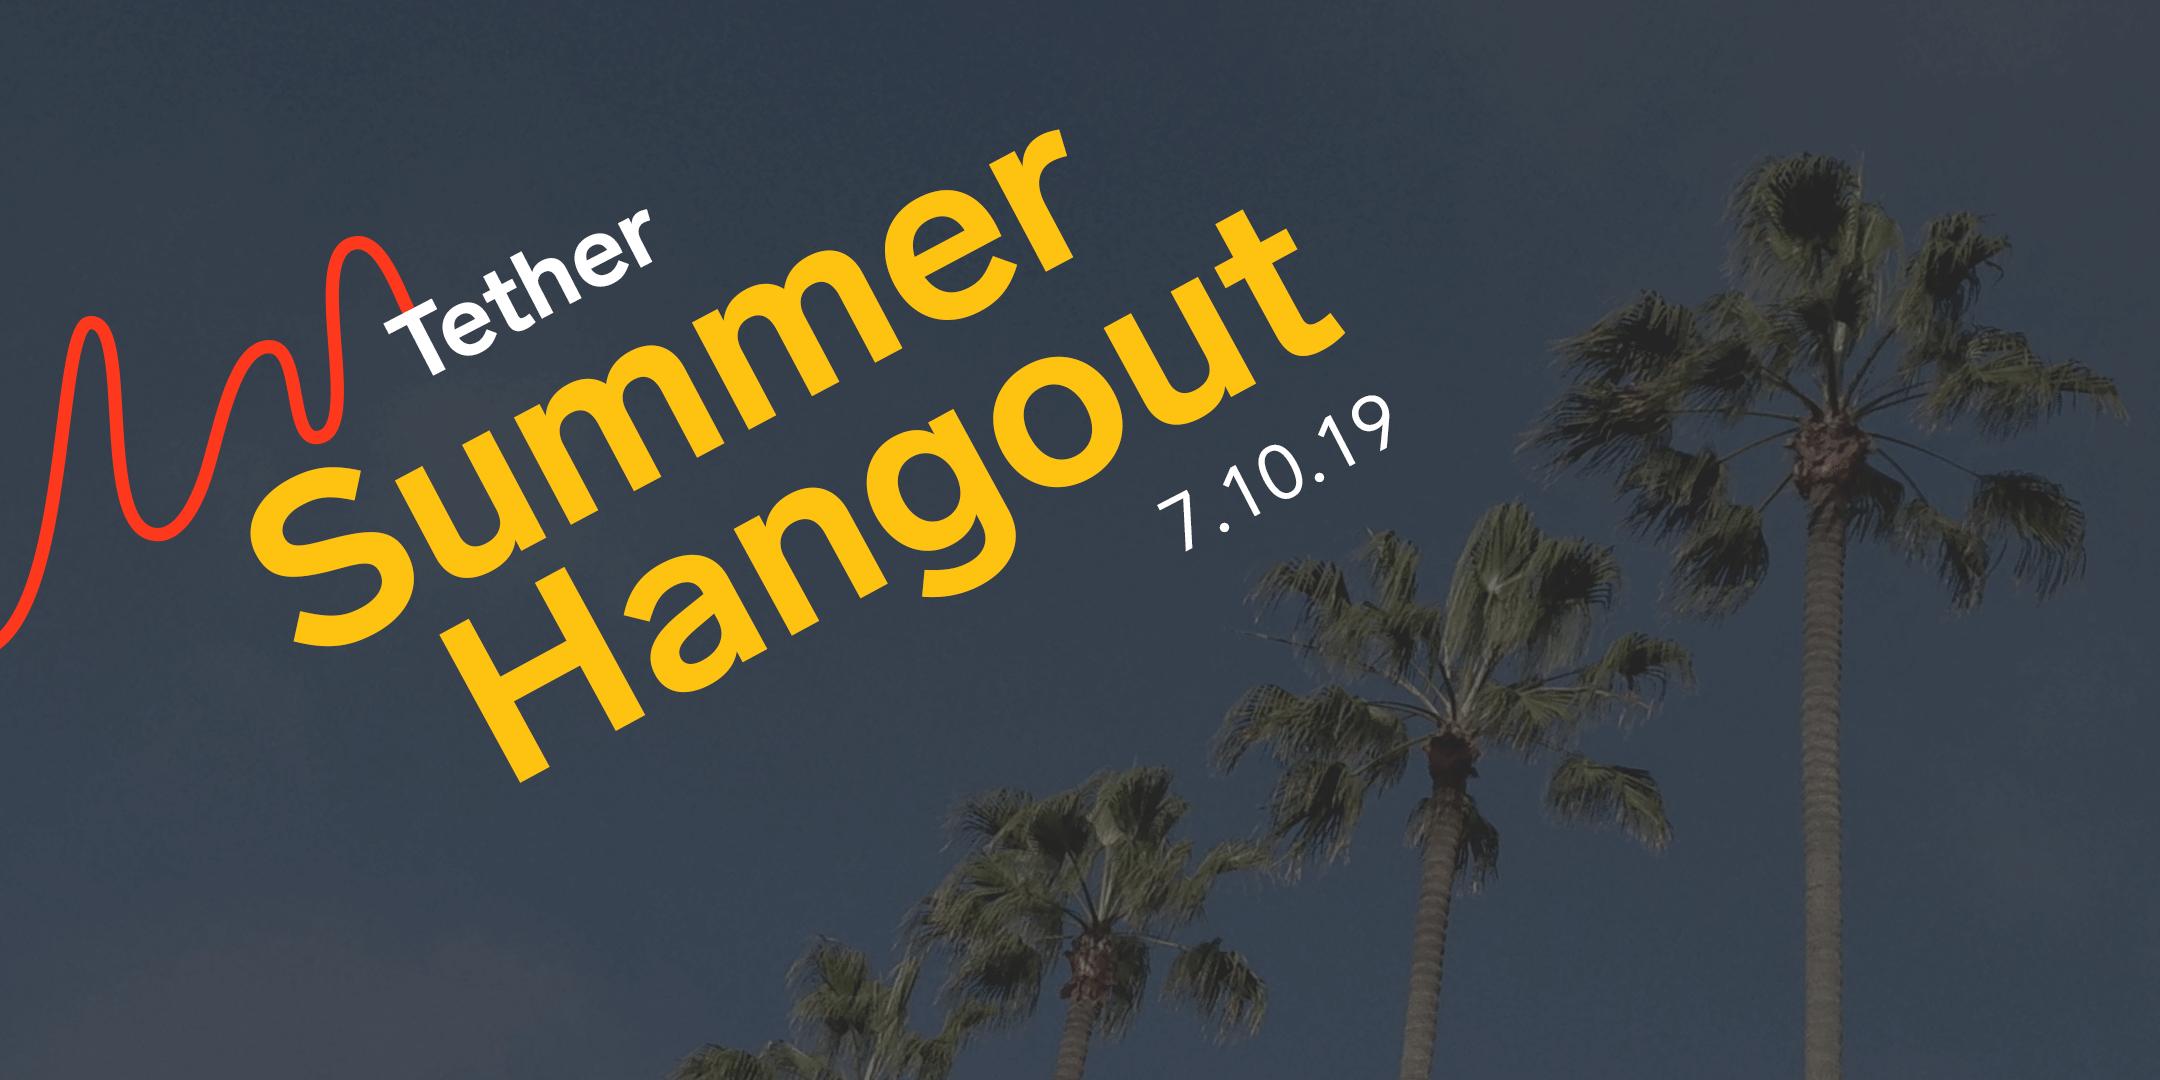 Summer-Hangout-Eventbrite-header.png